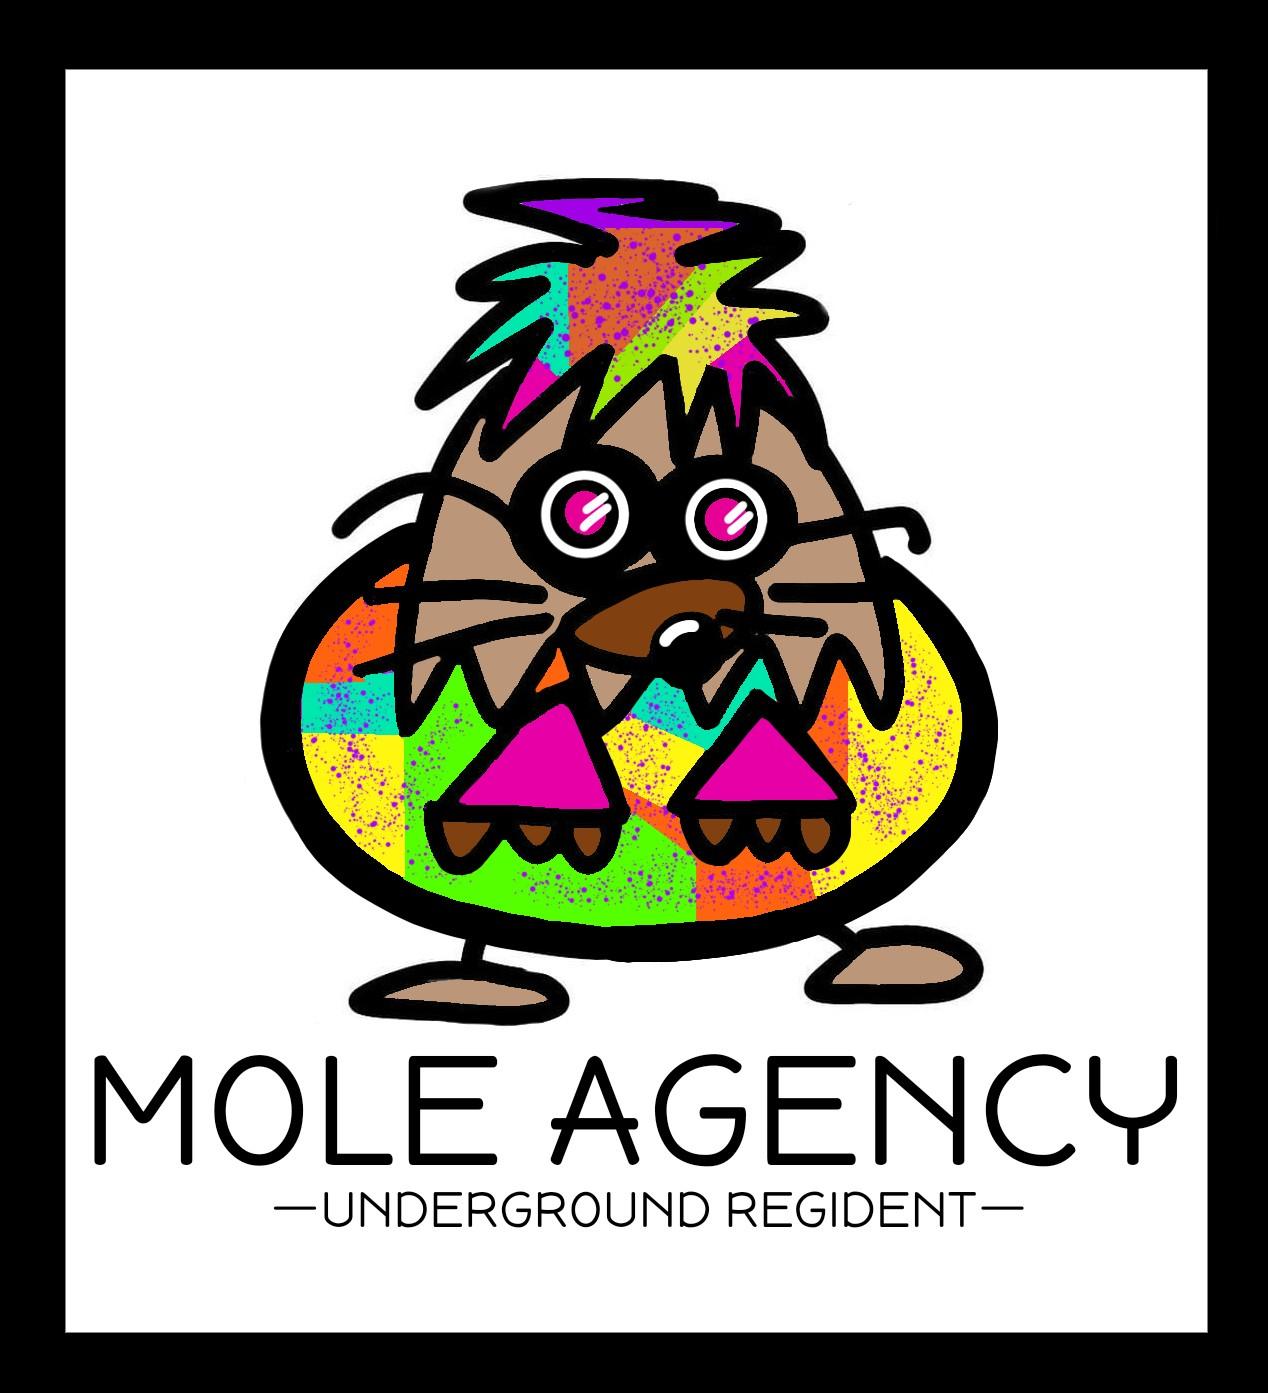 mole agency